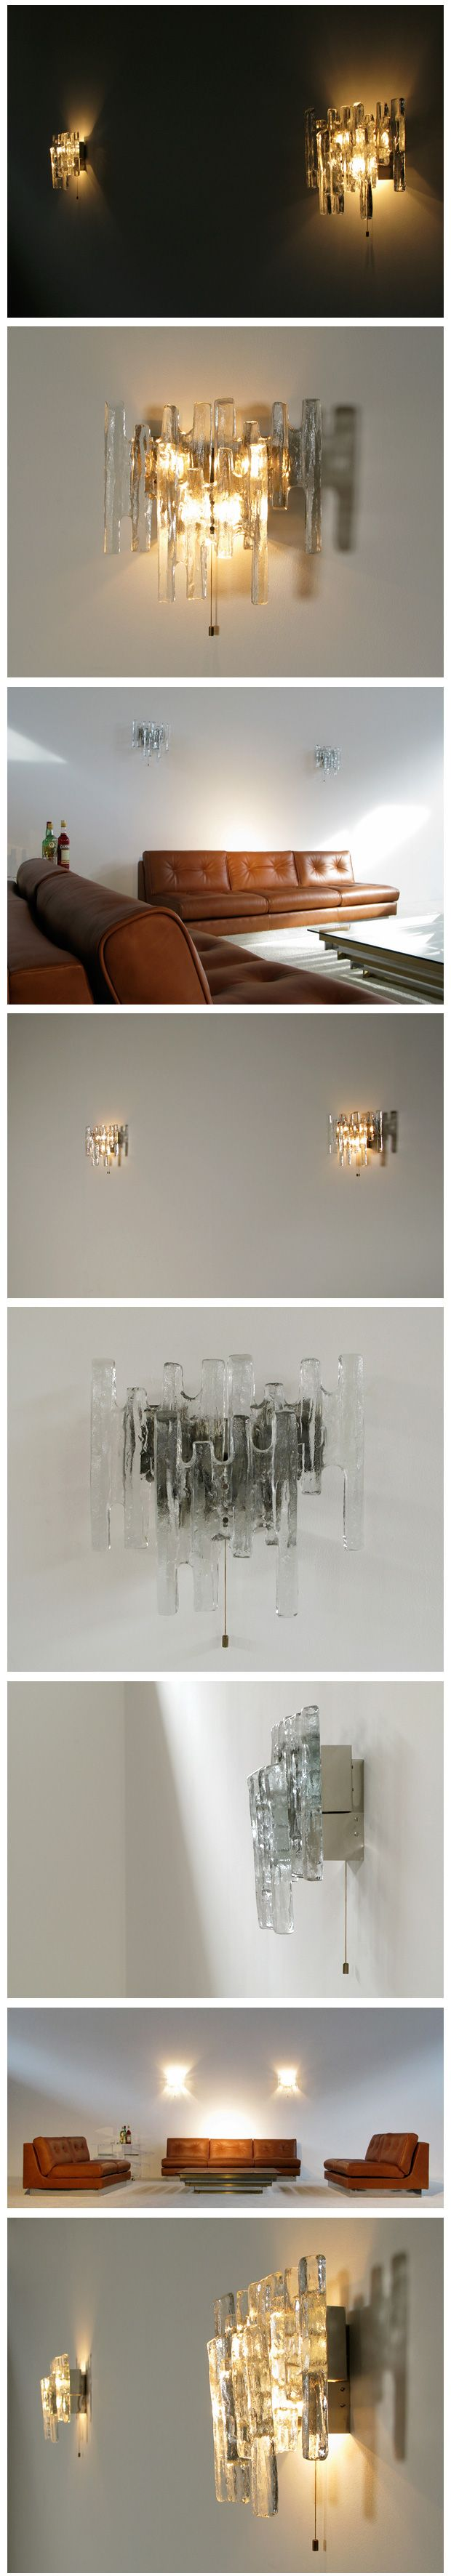 lighting fixtures las vegas. pair of kalmar glass sconces light sculpture 1970 lighting fixtures las vegas s